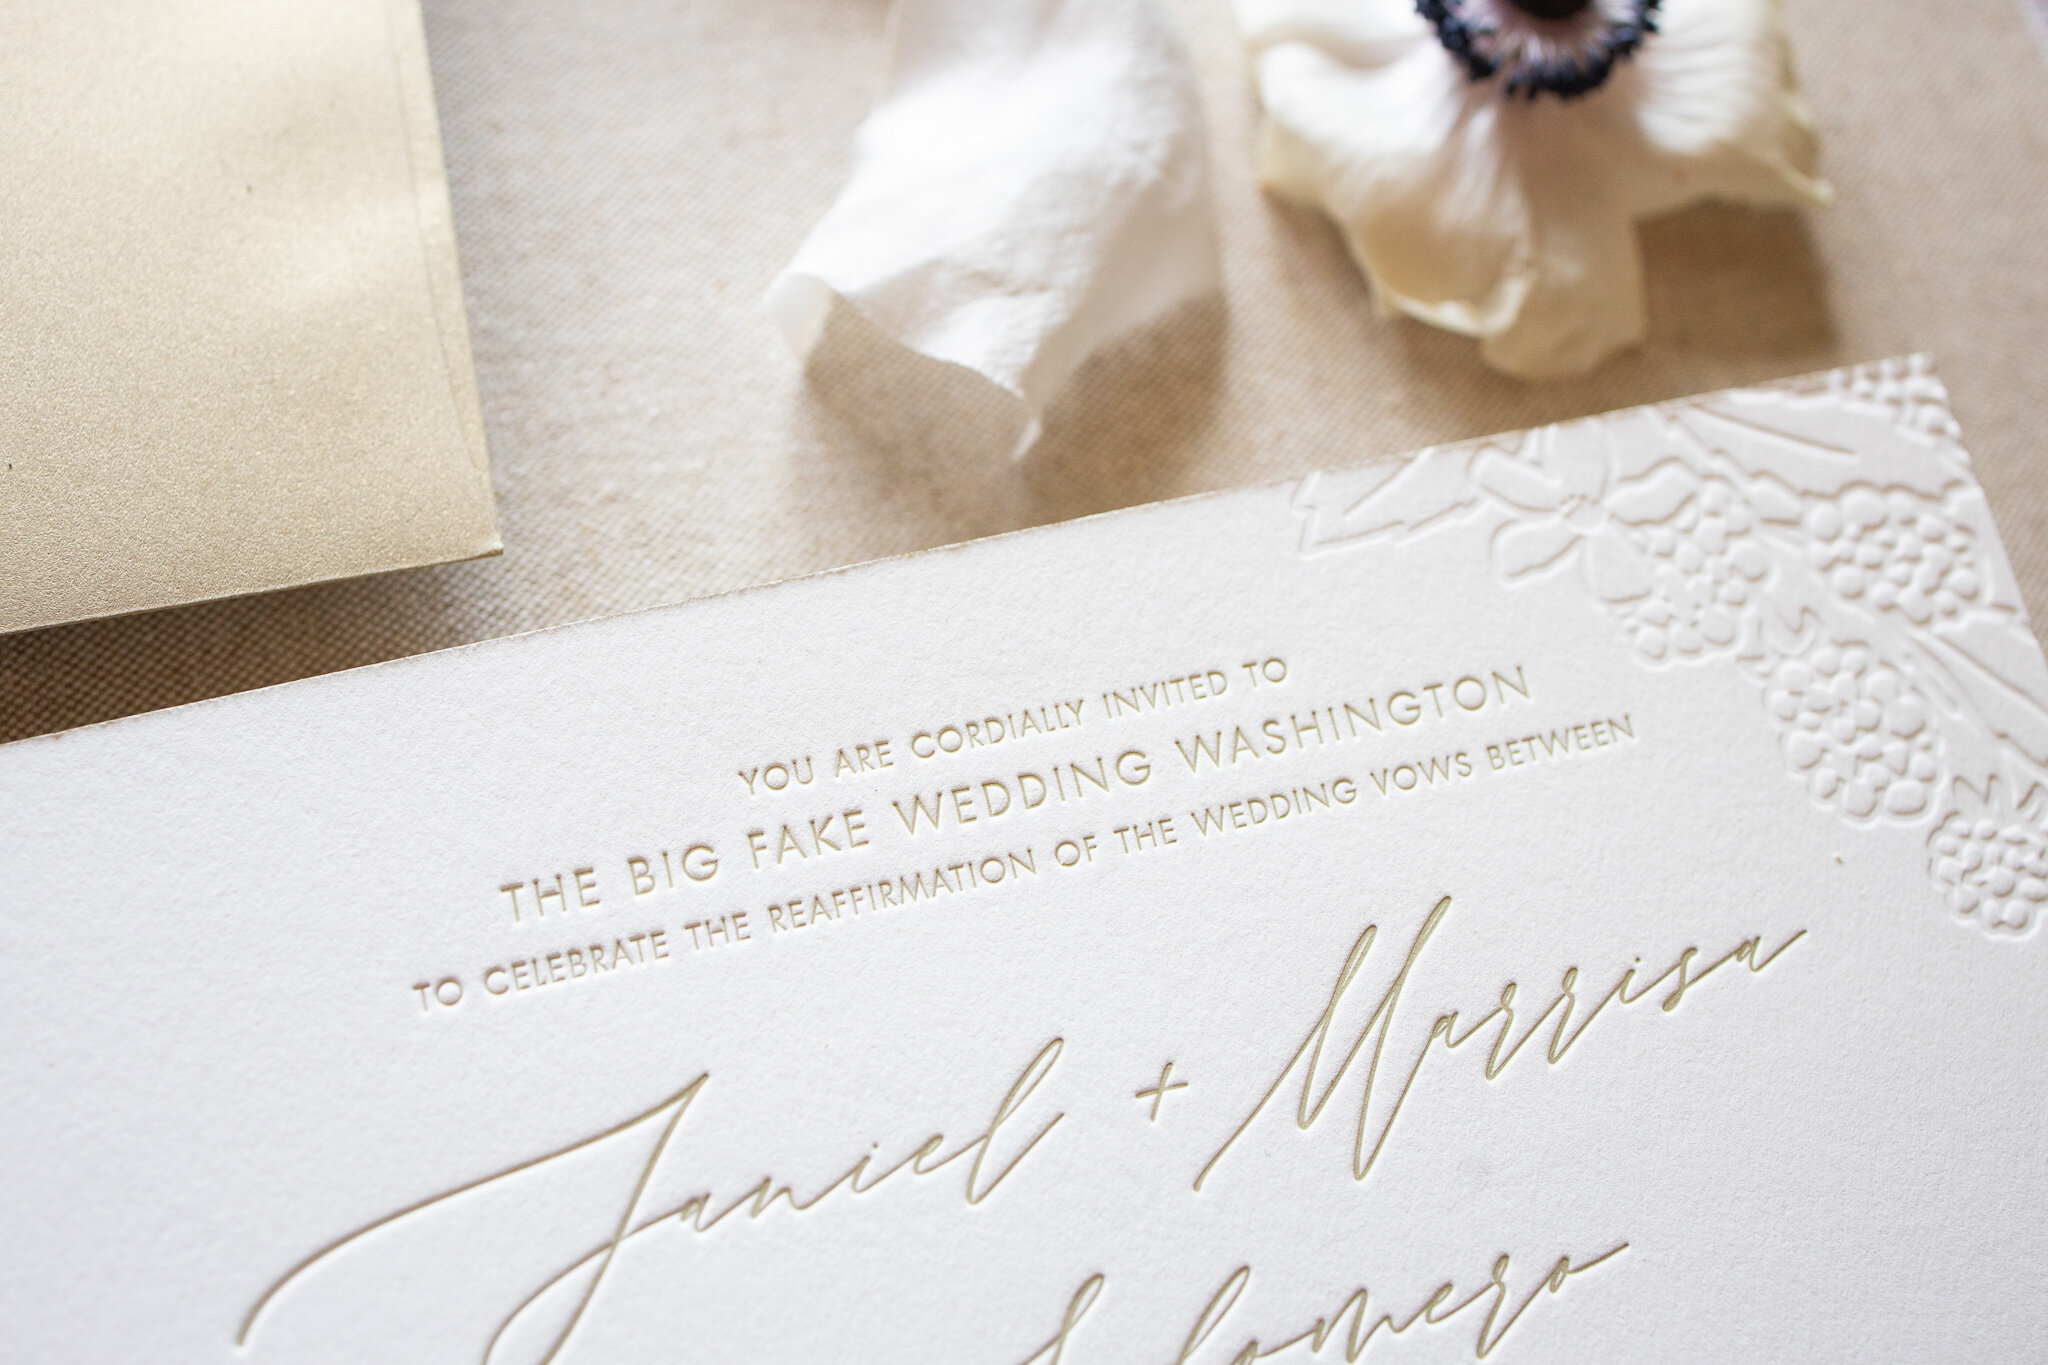 Champagne Gold Letterpress, Blind Debossing, & Digital Printing (wine glass illustrations)